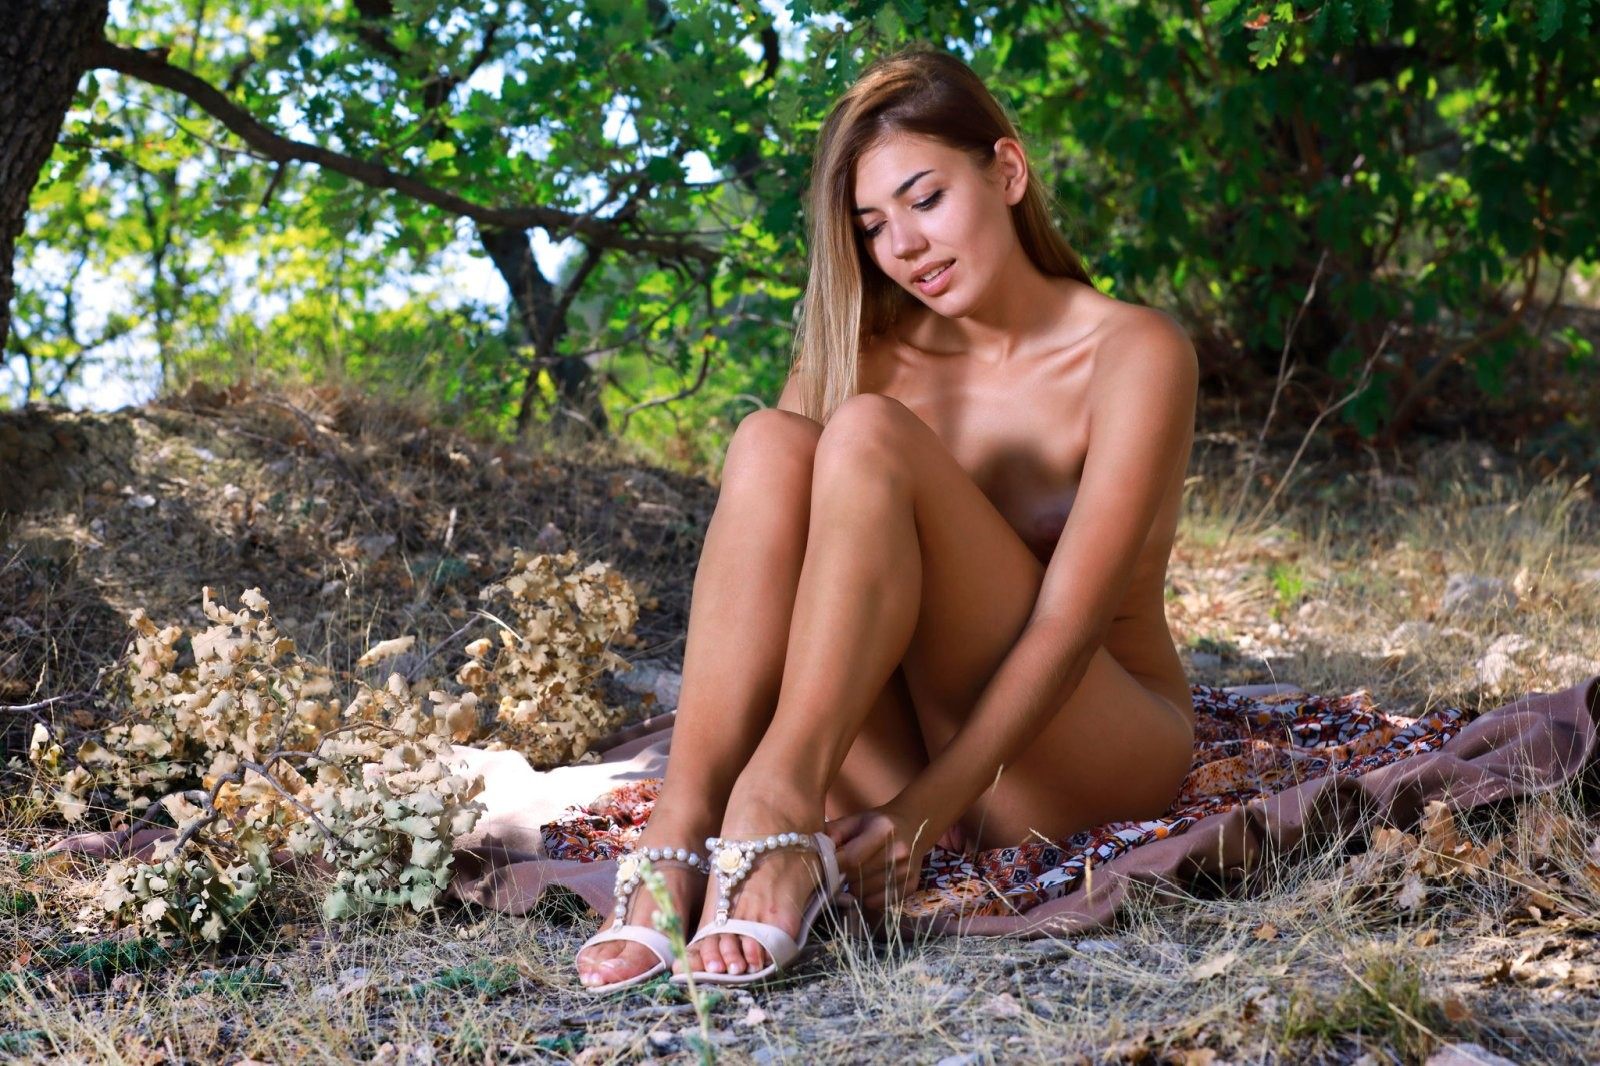 Сексуальная незнакомка на каникулах - фото